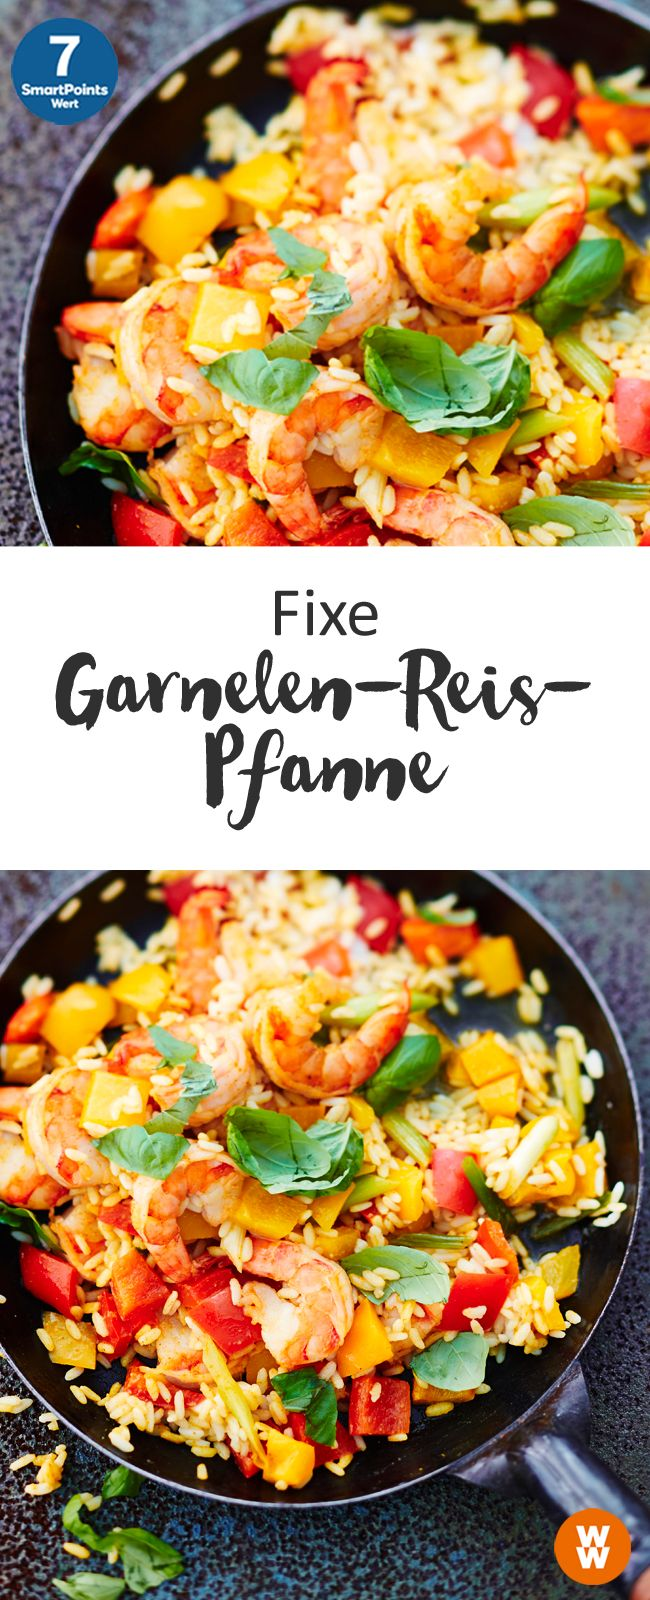 Fixe Garnelen-Reis-Pfanne #cleaneating